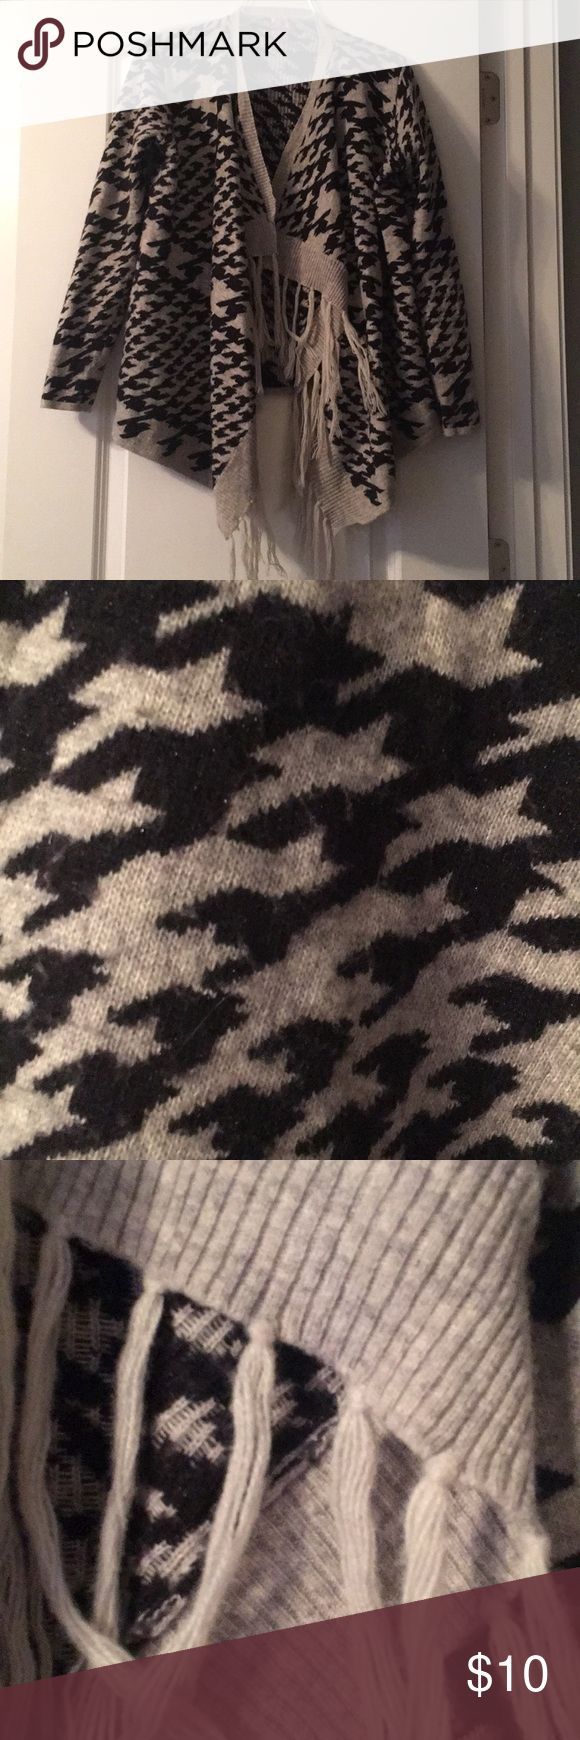 Gray and Black Shrug Sweater Olivia M. cozy patterned gray and black shrug sweater has some wear. 50% nylon, 40% acrylic, 5% angora, 5% lurex. Olivia M Sweaters Shrugs & Ponchos